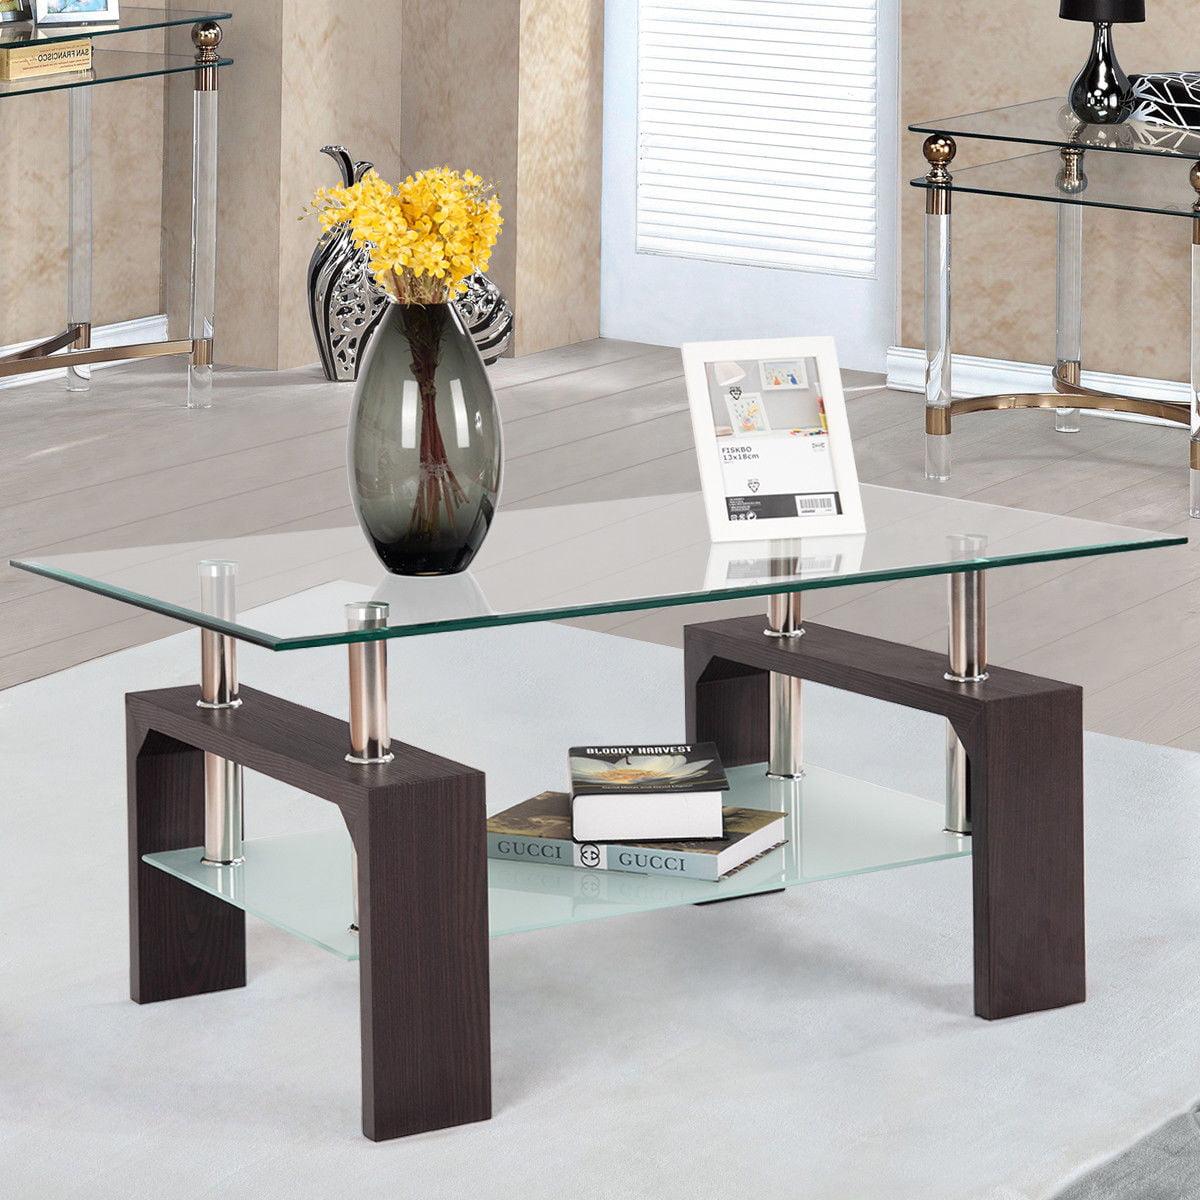 Costway Rectangular Tempered Glass Coffee Table W/Shelf Wood Living Room  Furniture - Walmart.com - Walmart.com